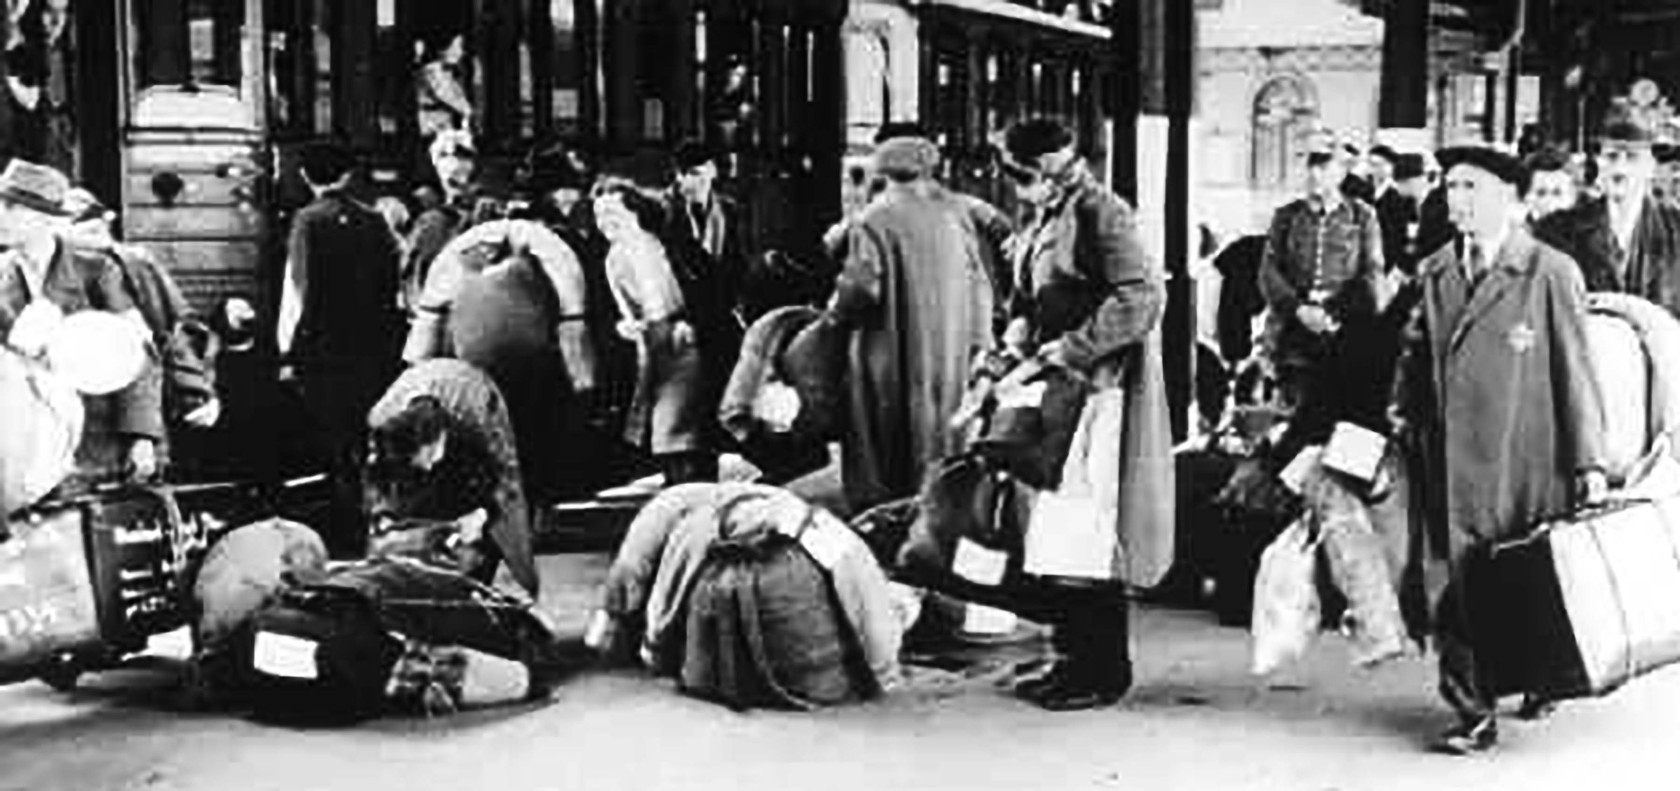 deportation-of-jews-from-hanau-outside-frankfurt-am-main.jpg